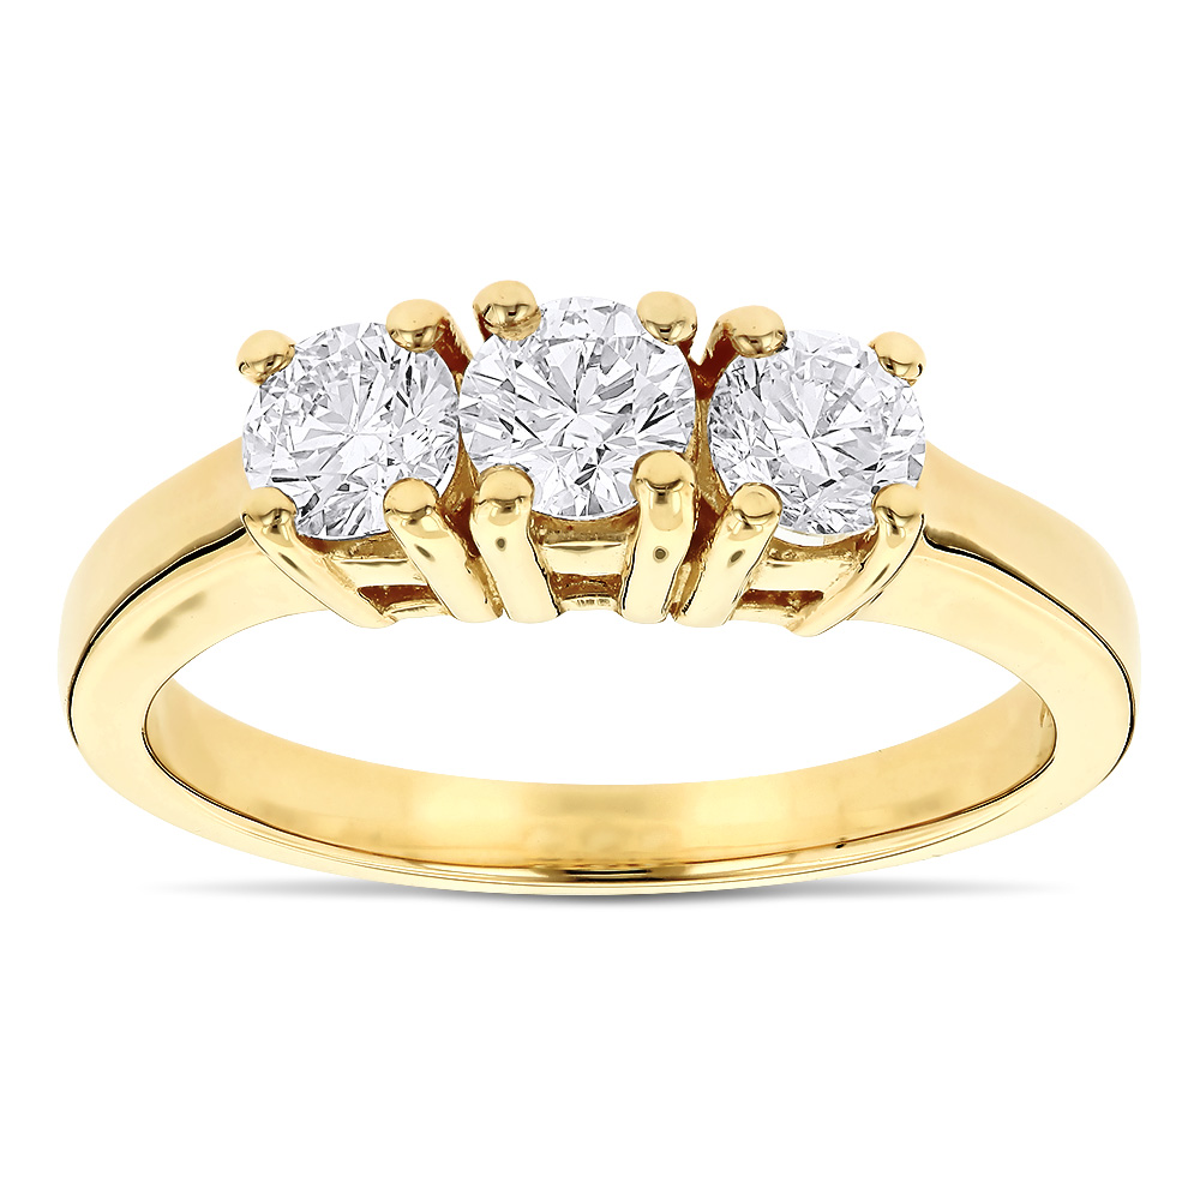 14K Gold Three Stone Diamond Ring Past Present Future 1 Carat